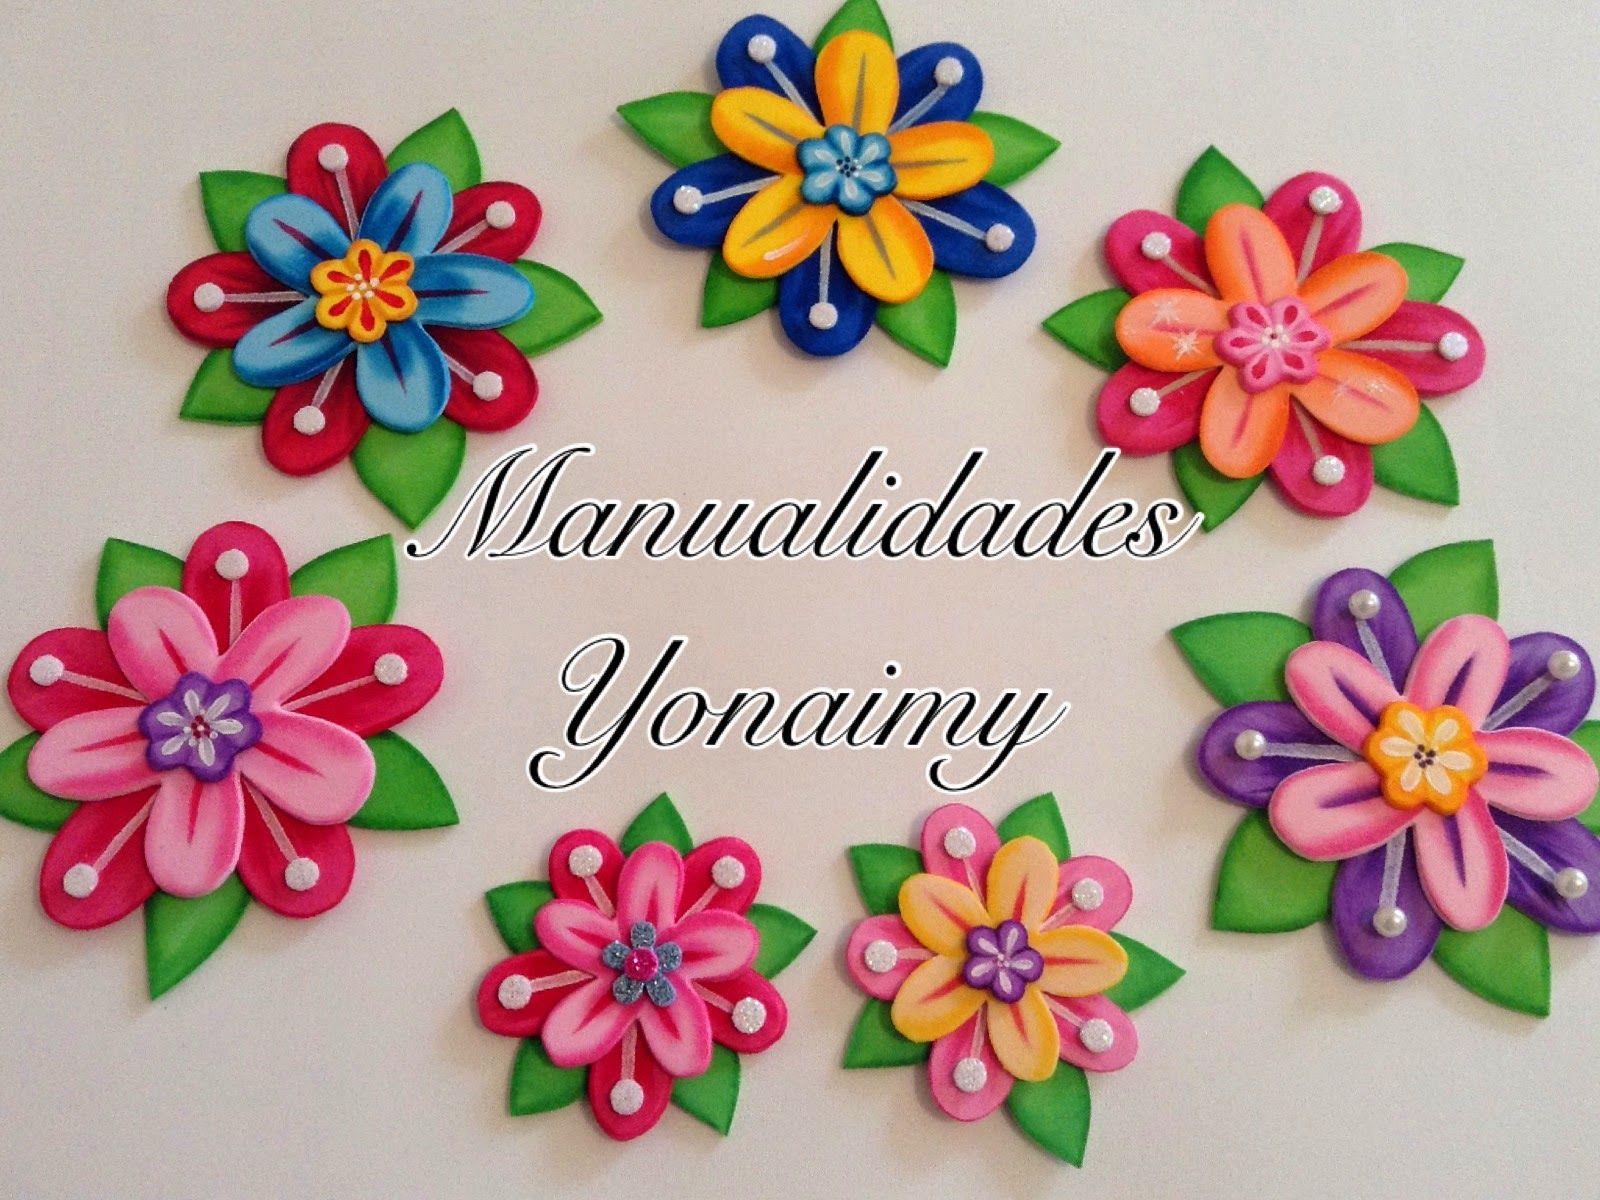 Manualidades yonaimy flores de princesa en foamy goma eva - Flore de goma eva ...